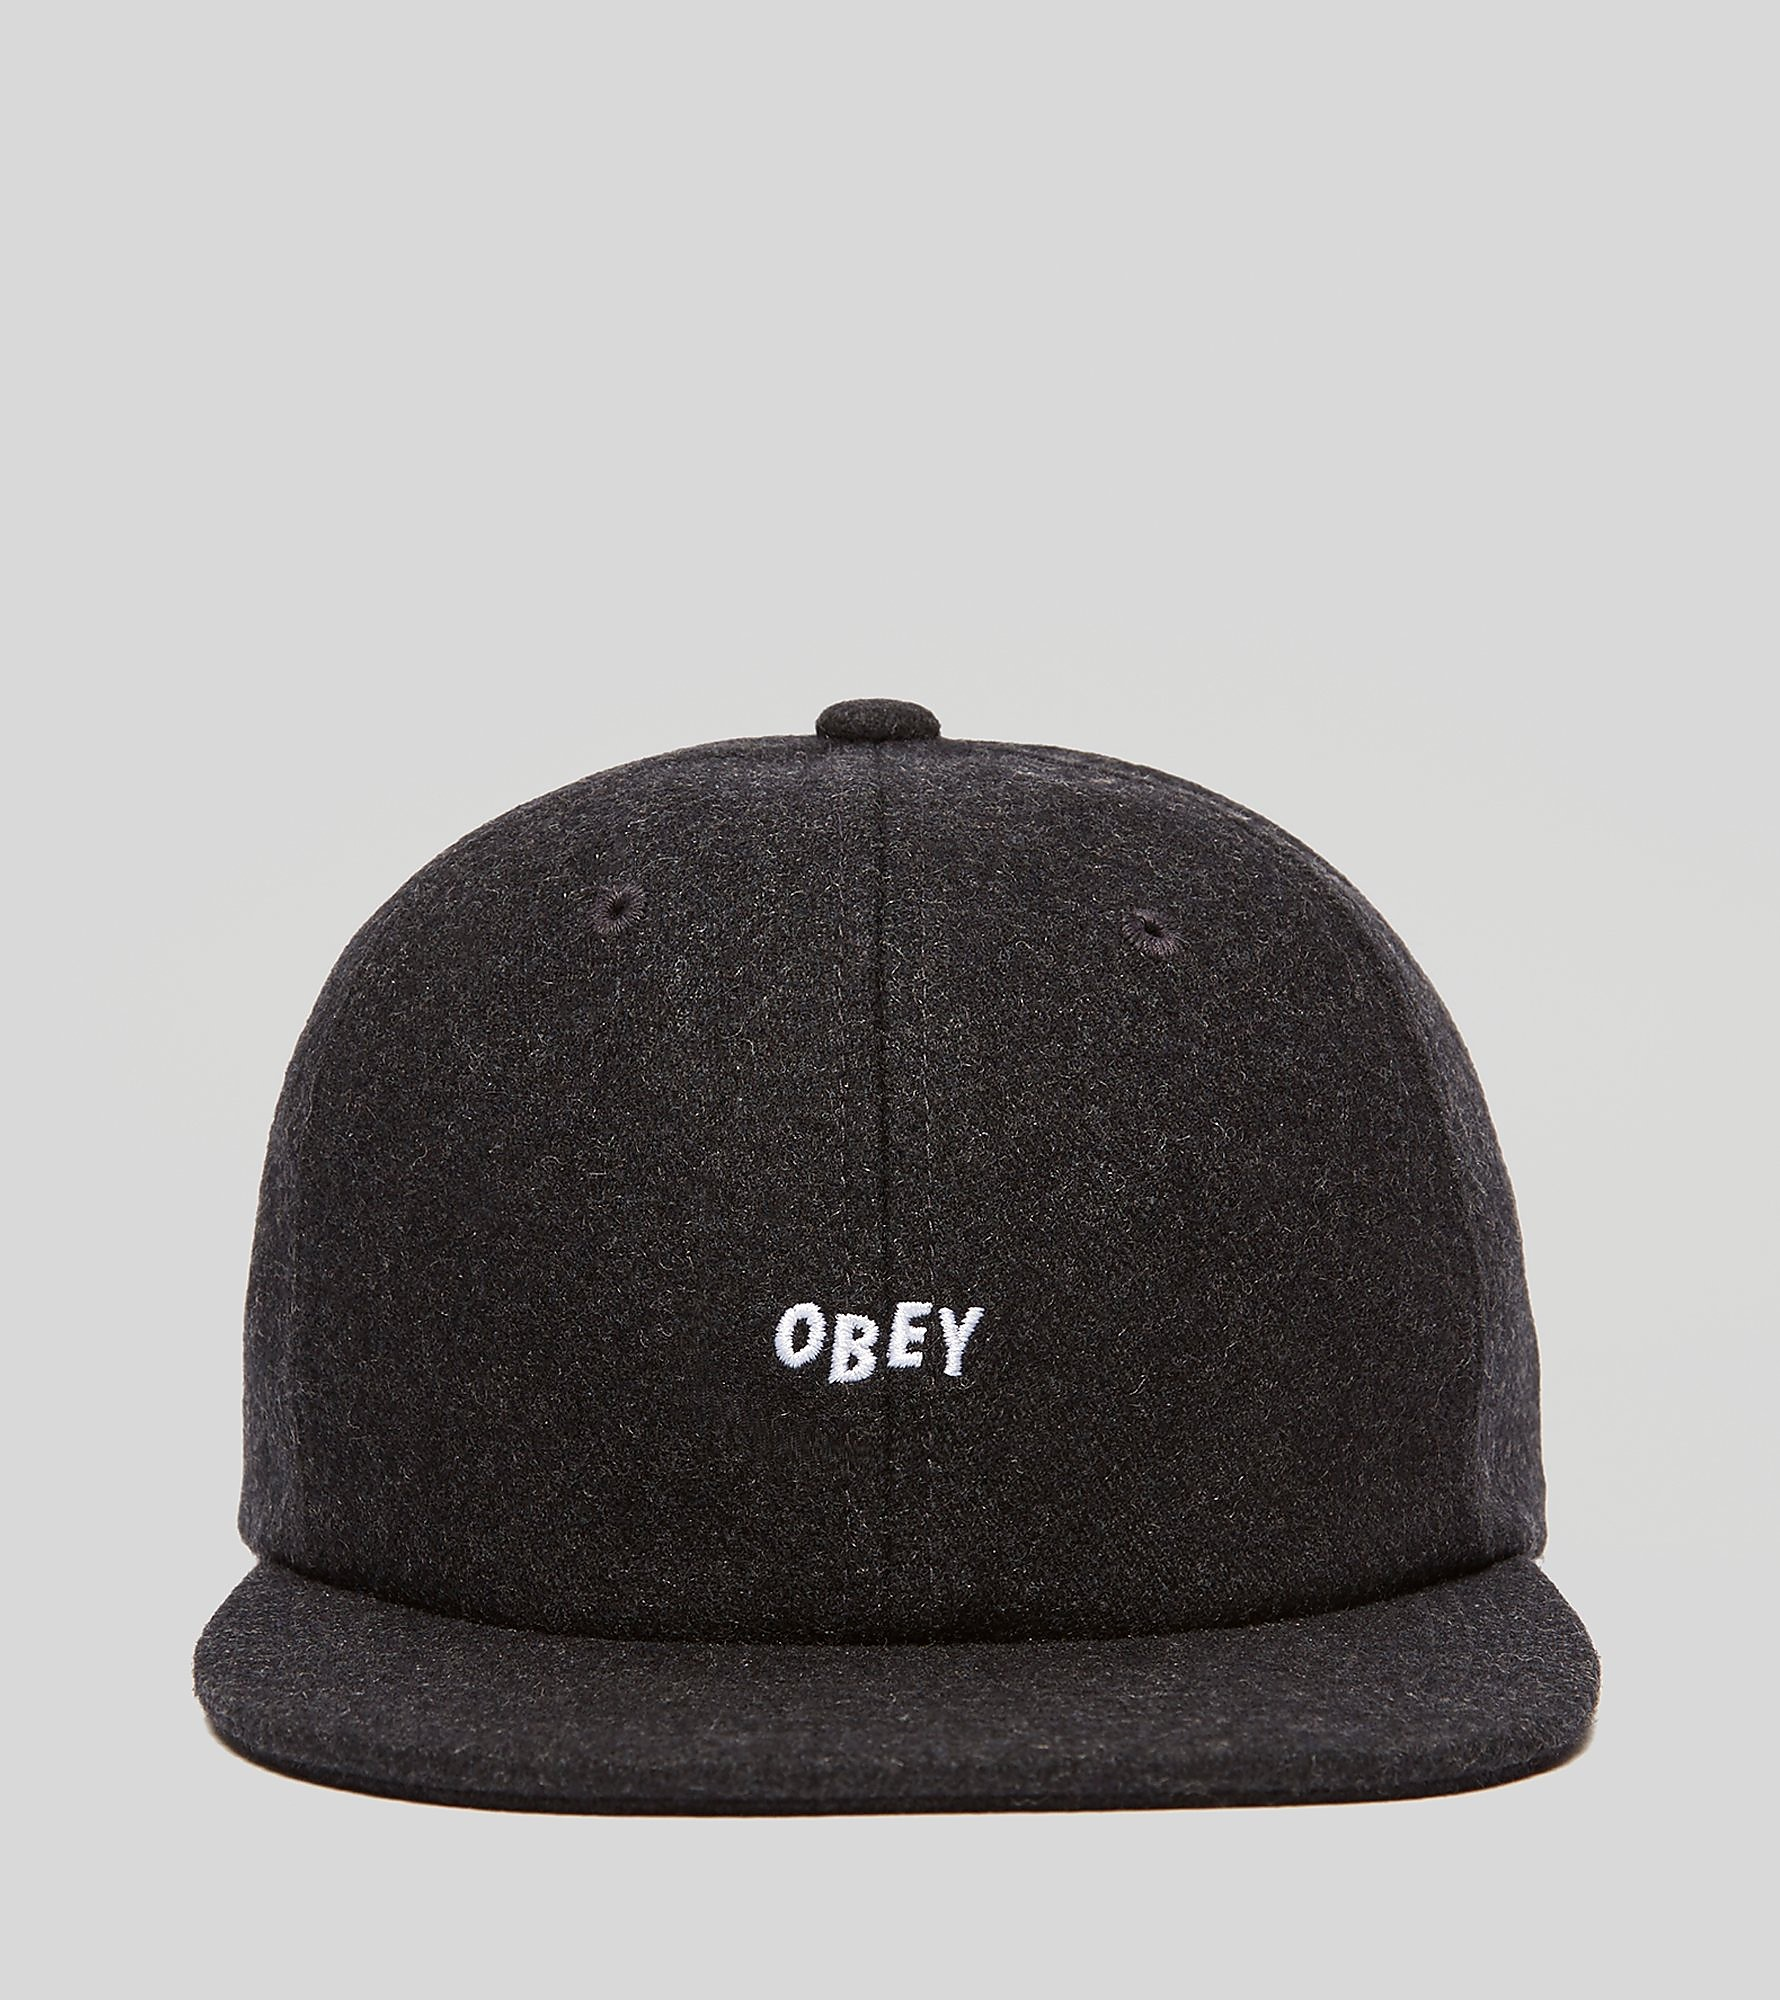 Obey Kilson Cap